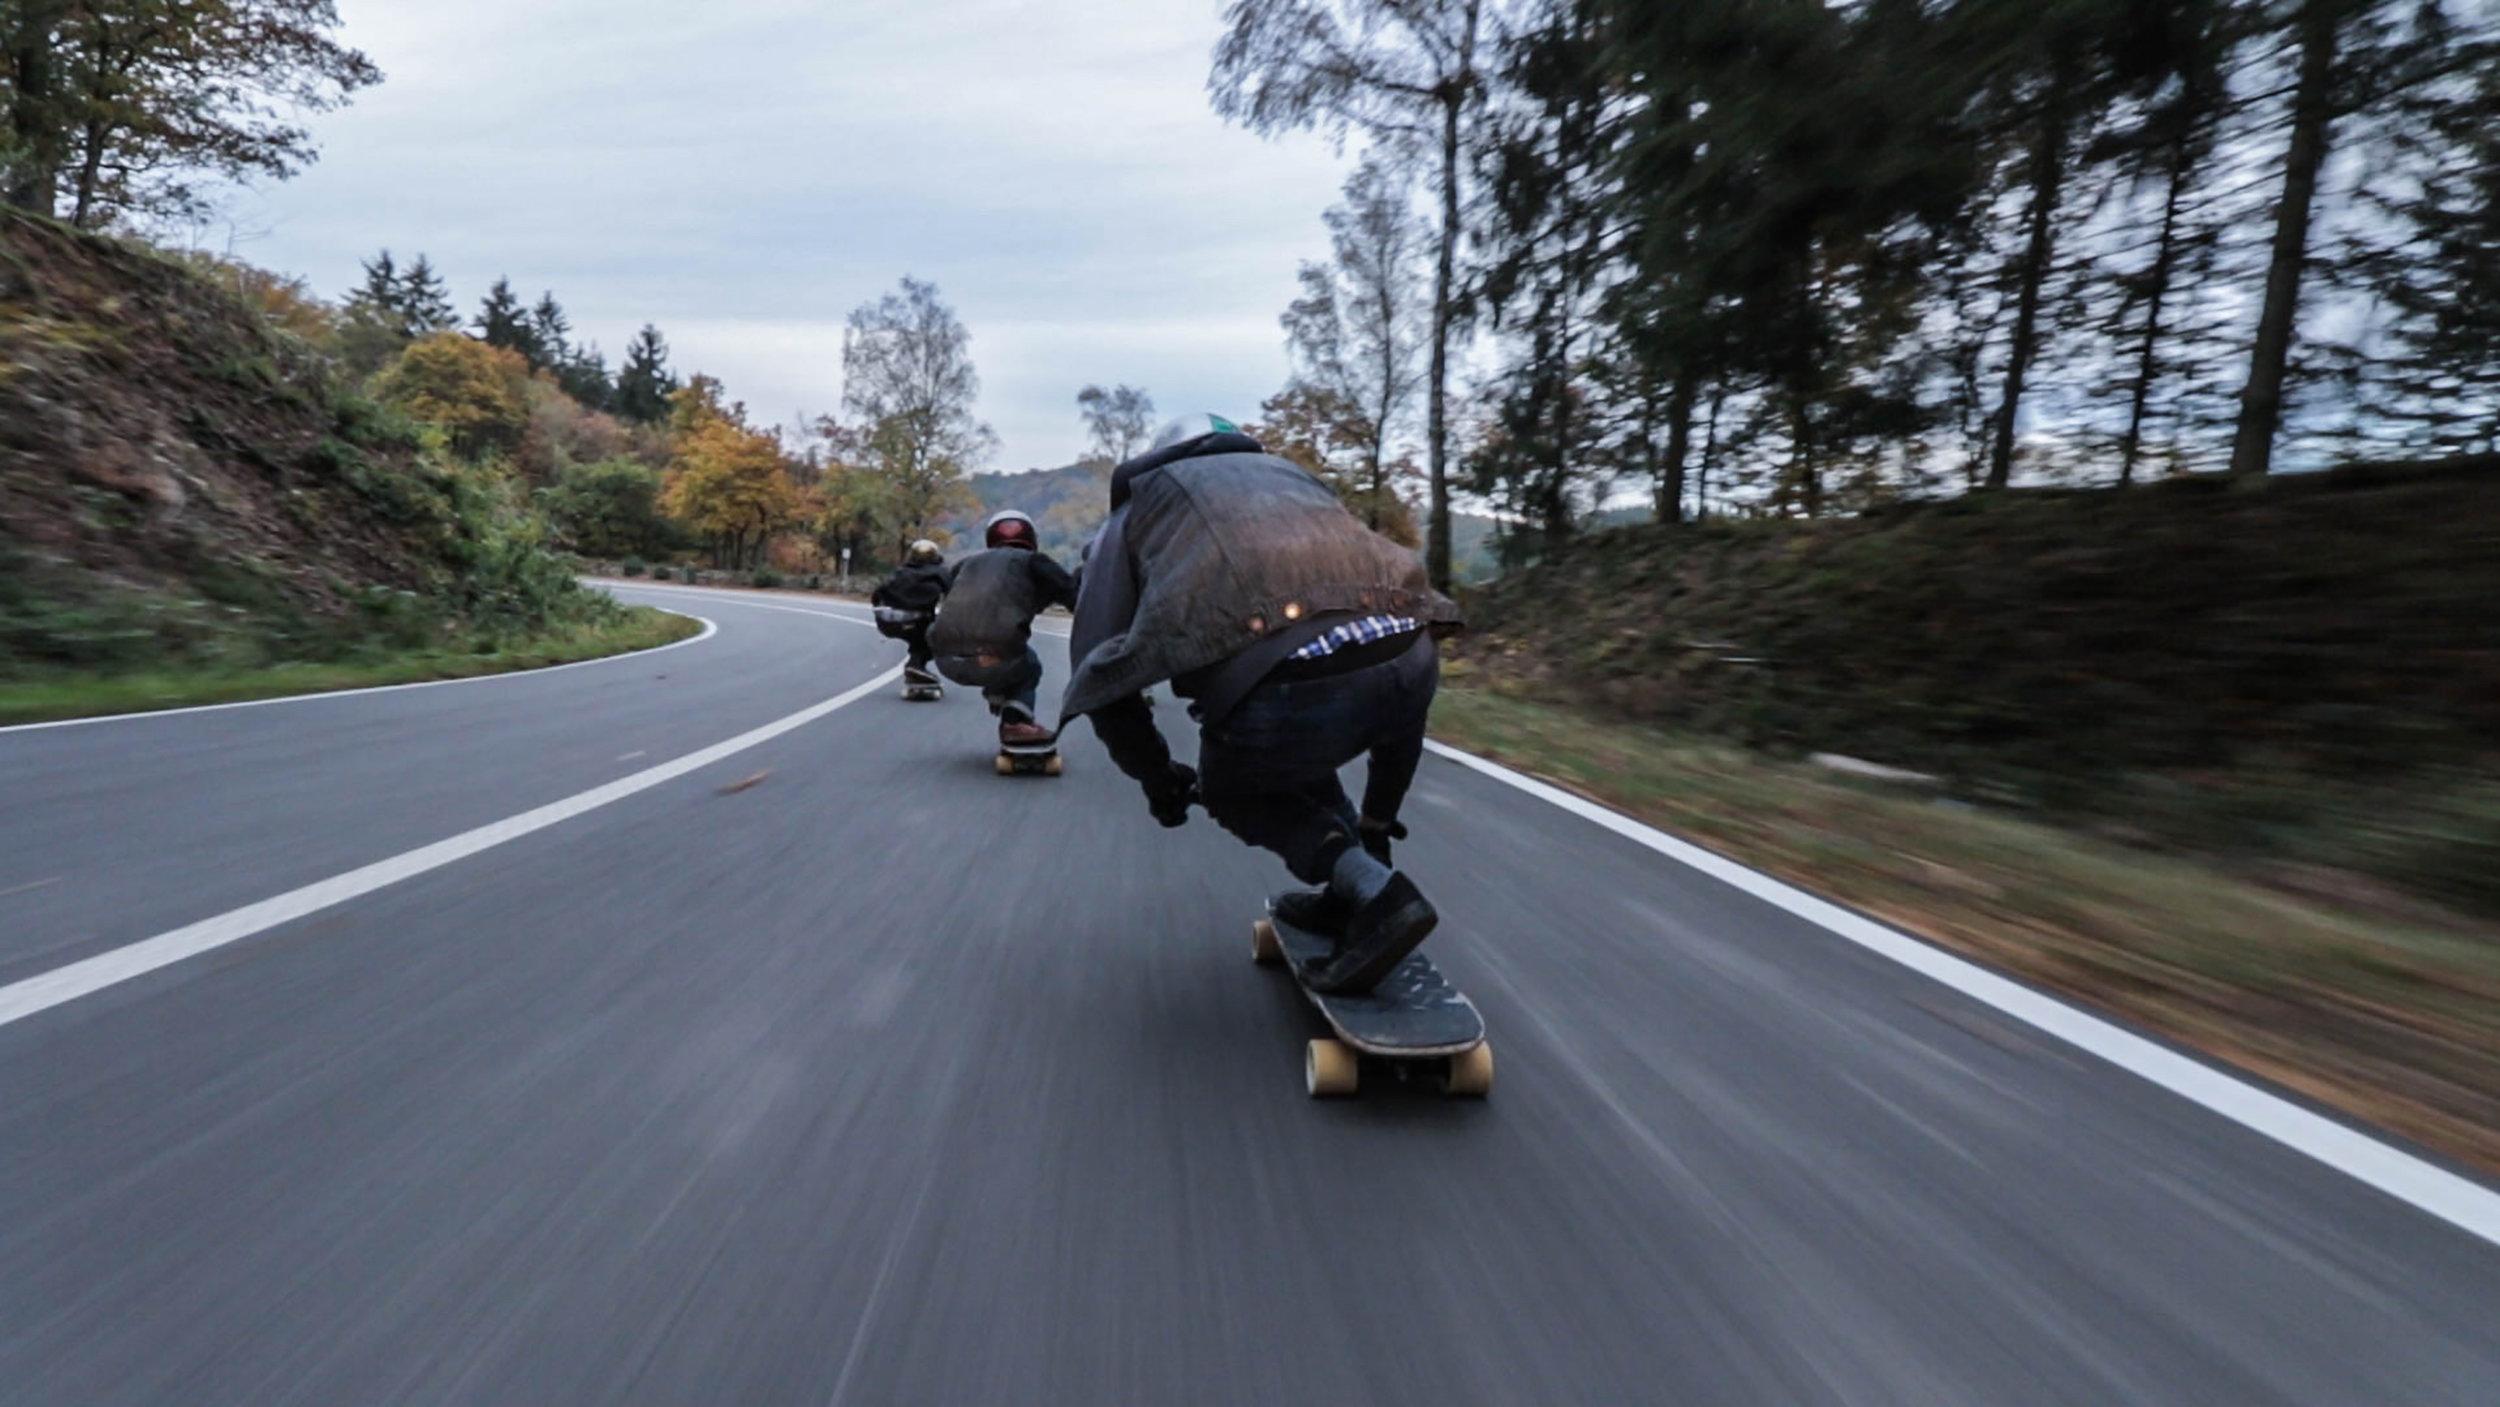 Copy of Skaters